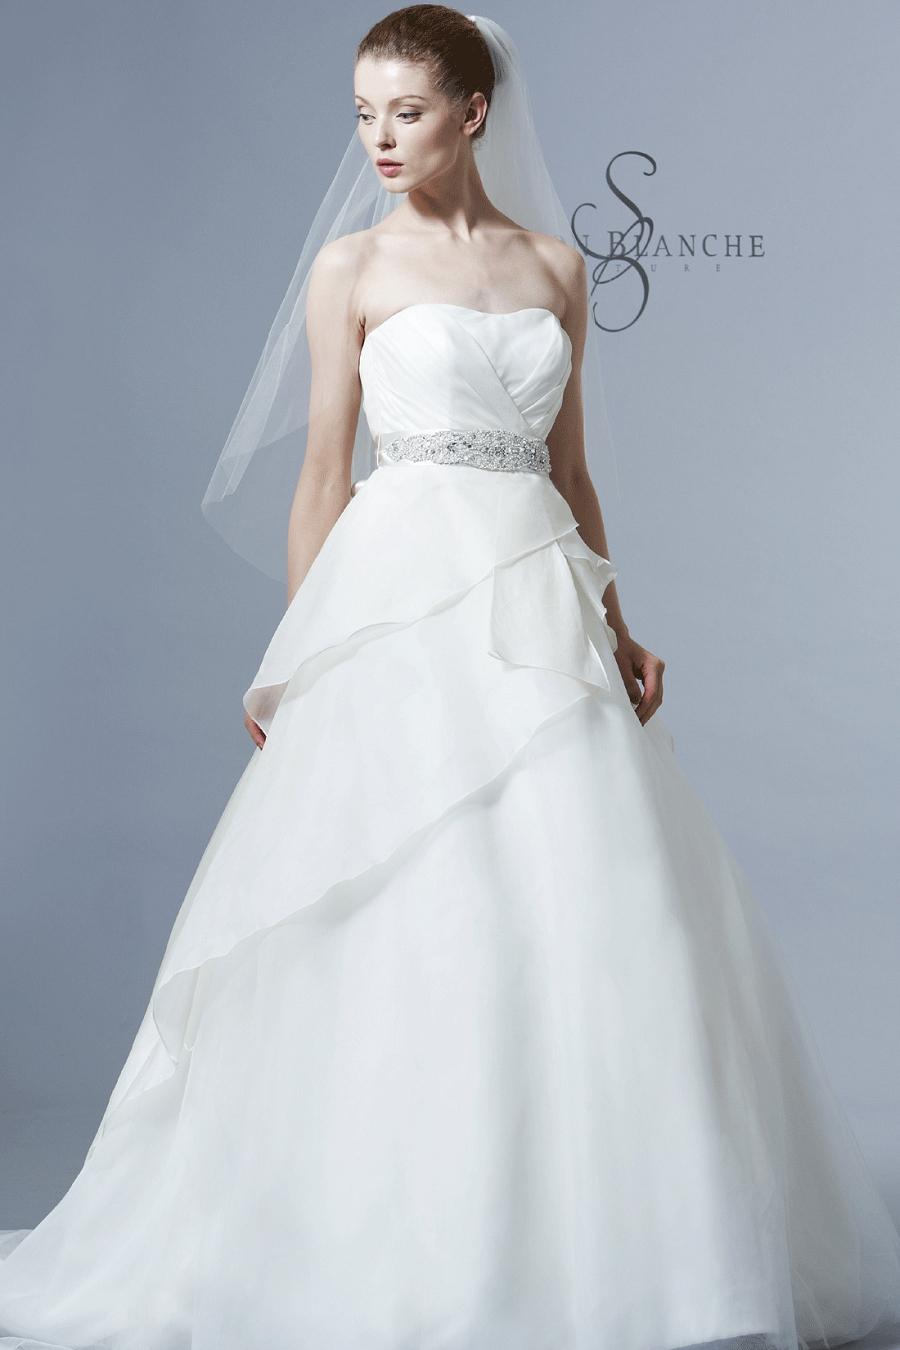 Blog Of Wedding And Occasion Wear 2014 Fairy Tale Wedding